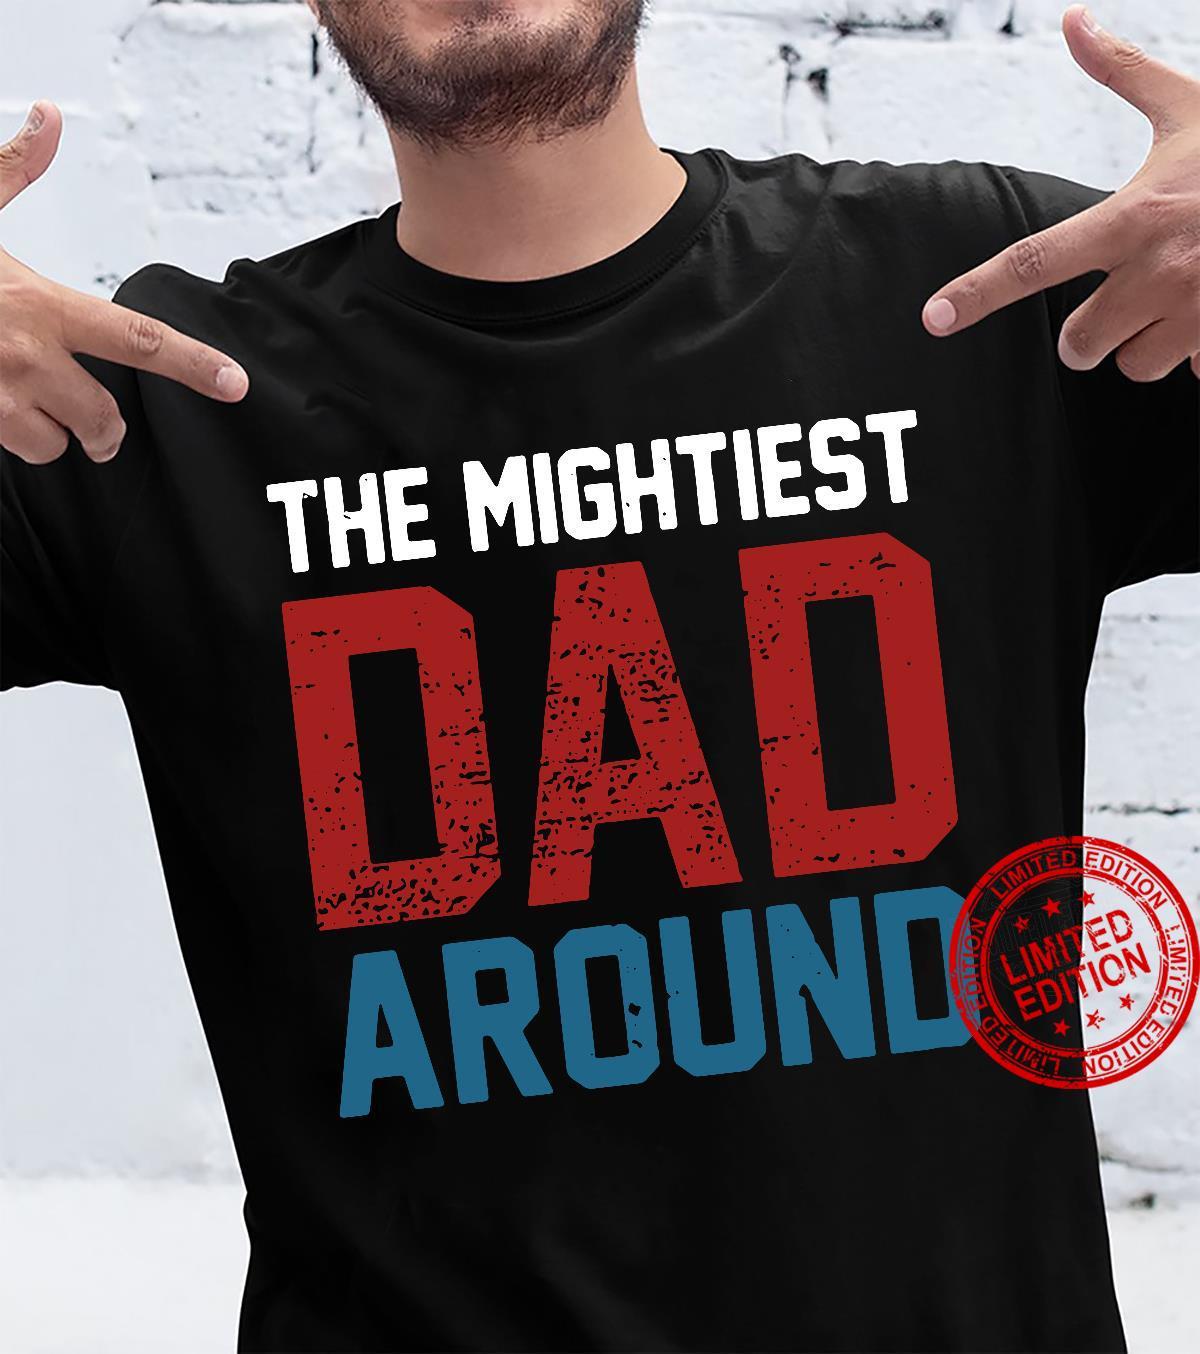 The mightiest Dad around shirt